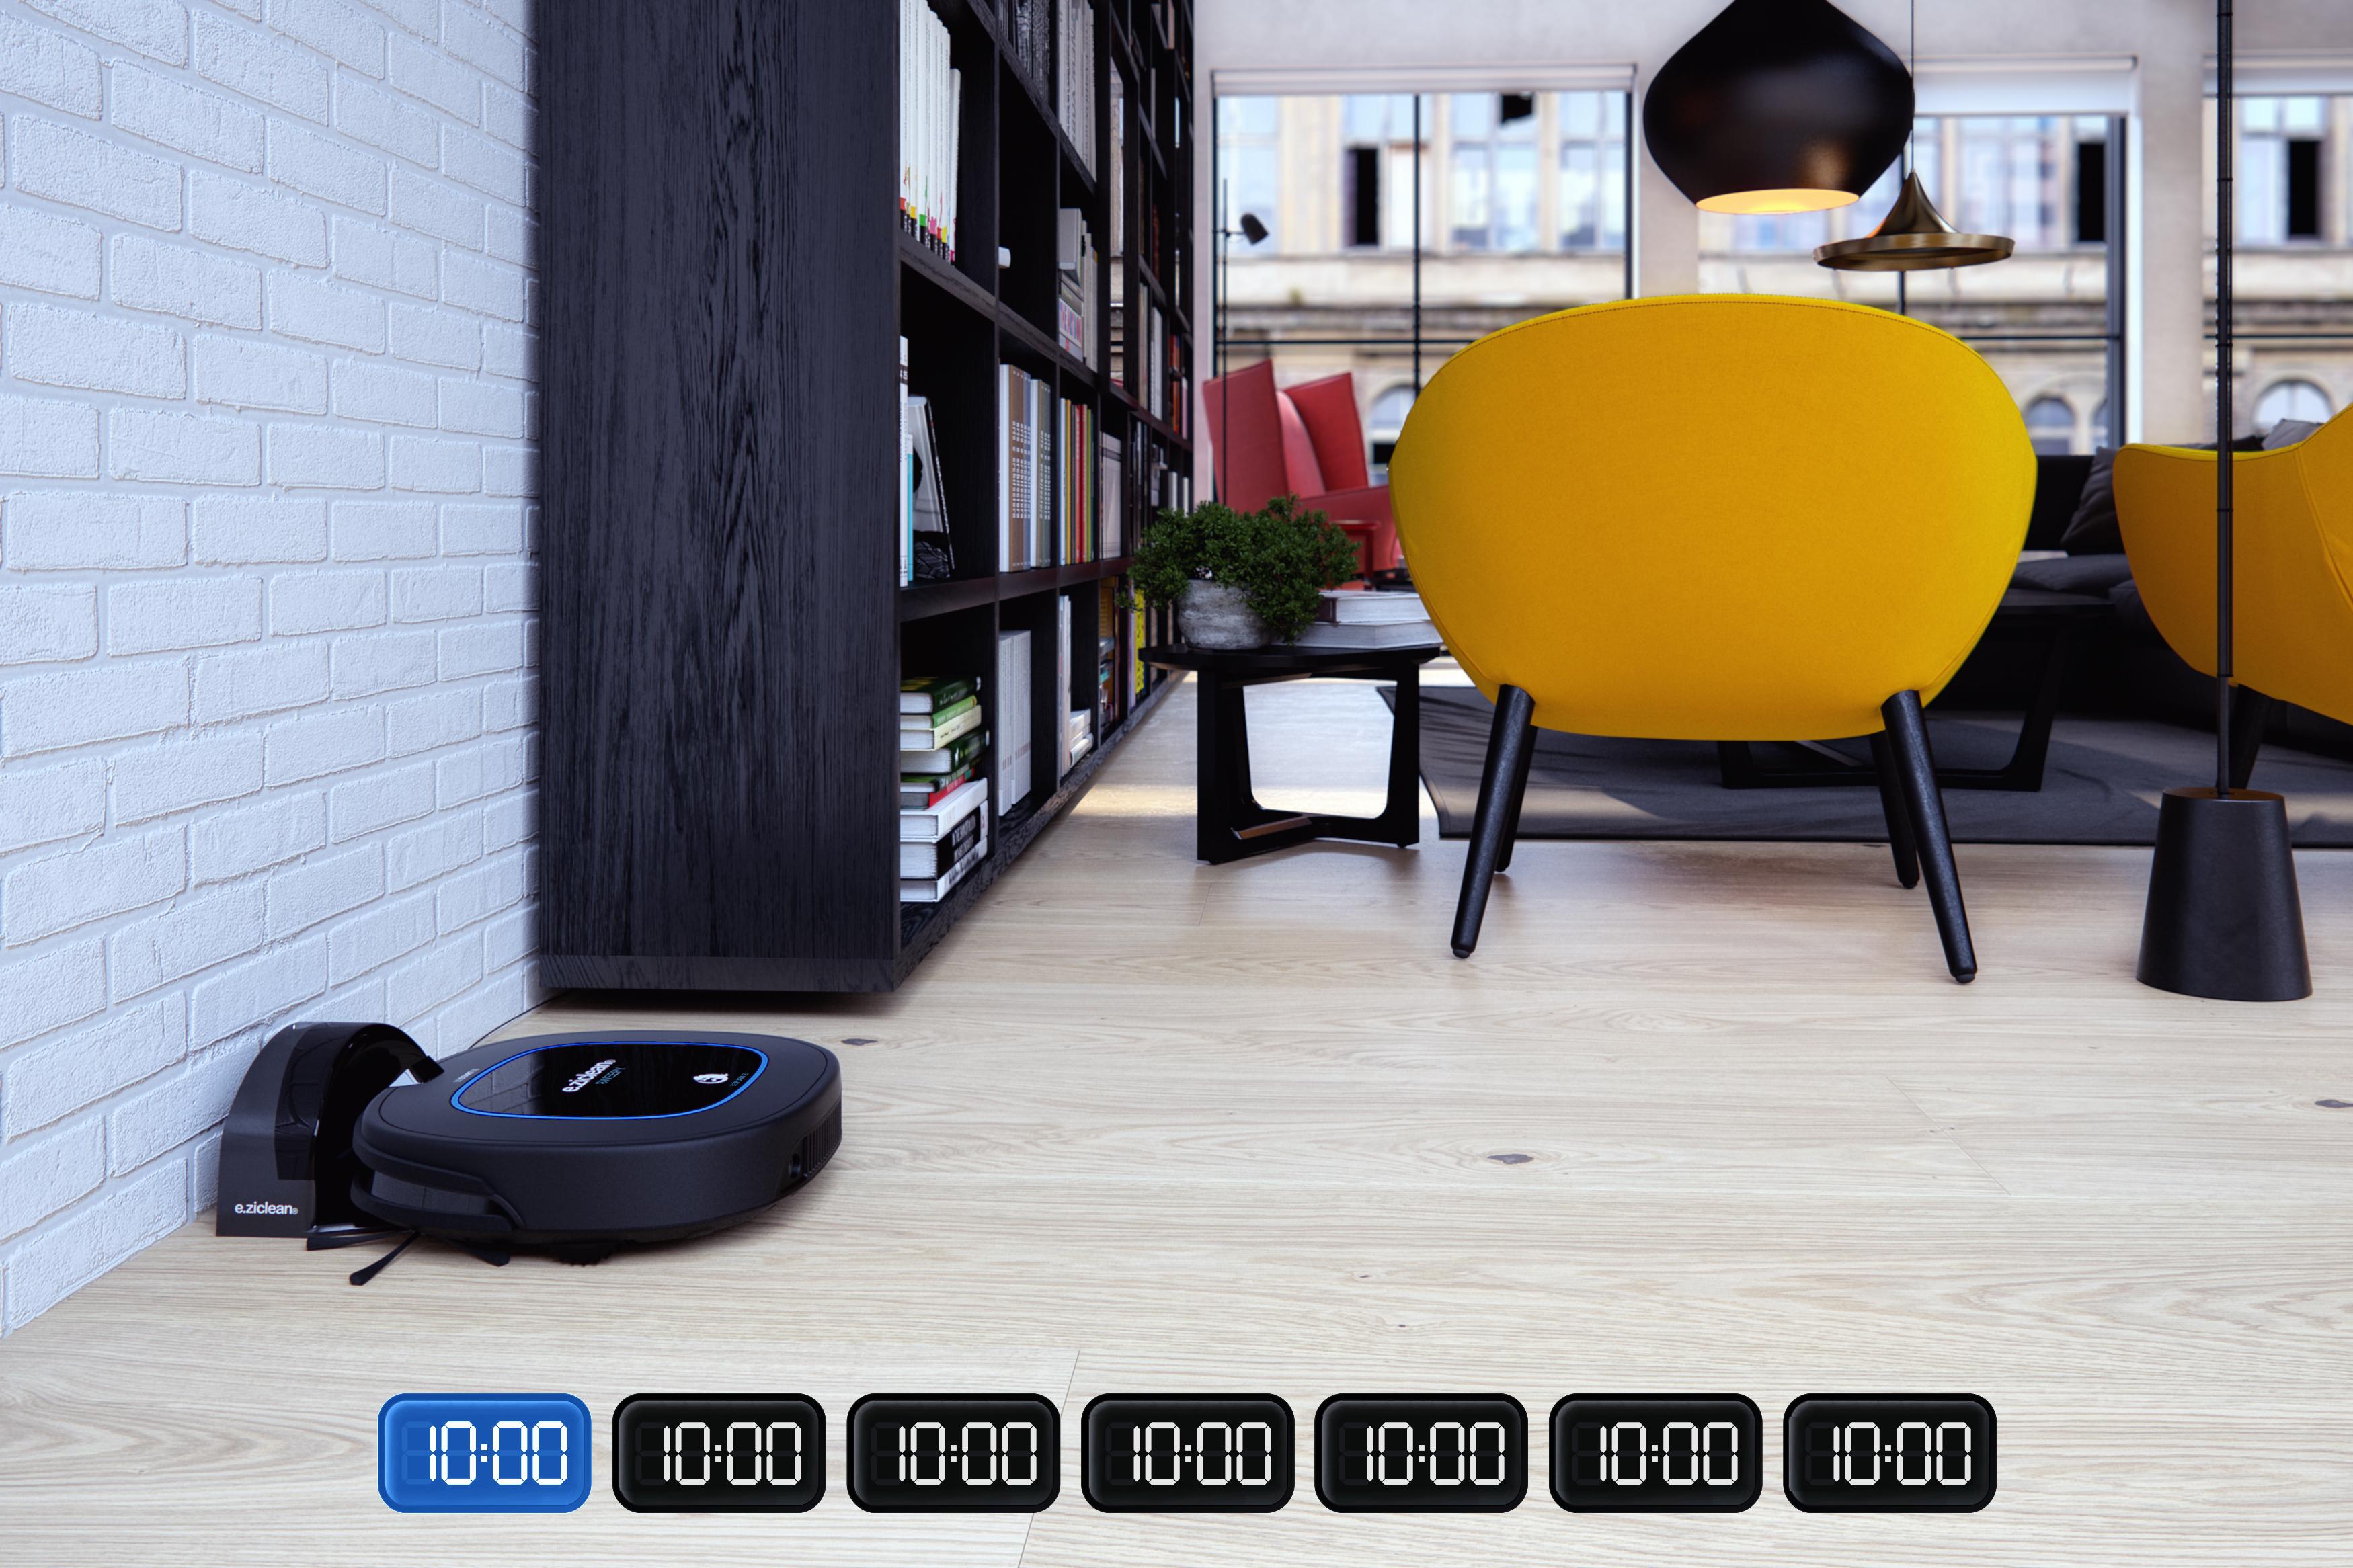 sweepy pets robot programmable 7j/7